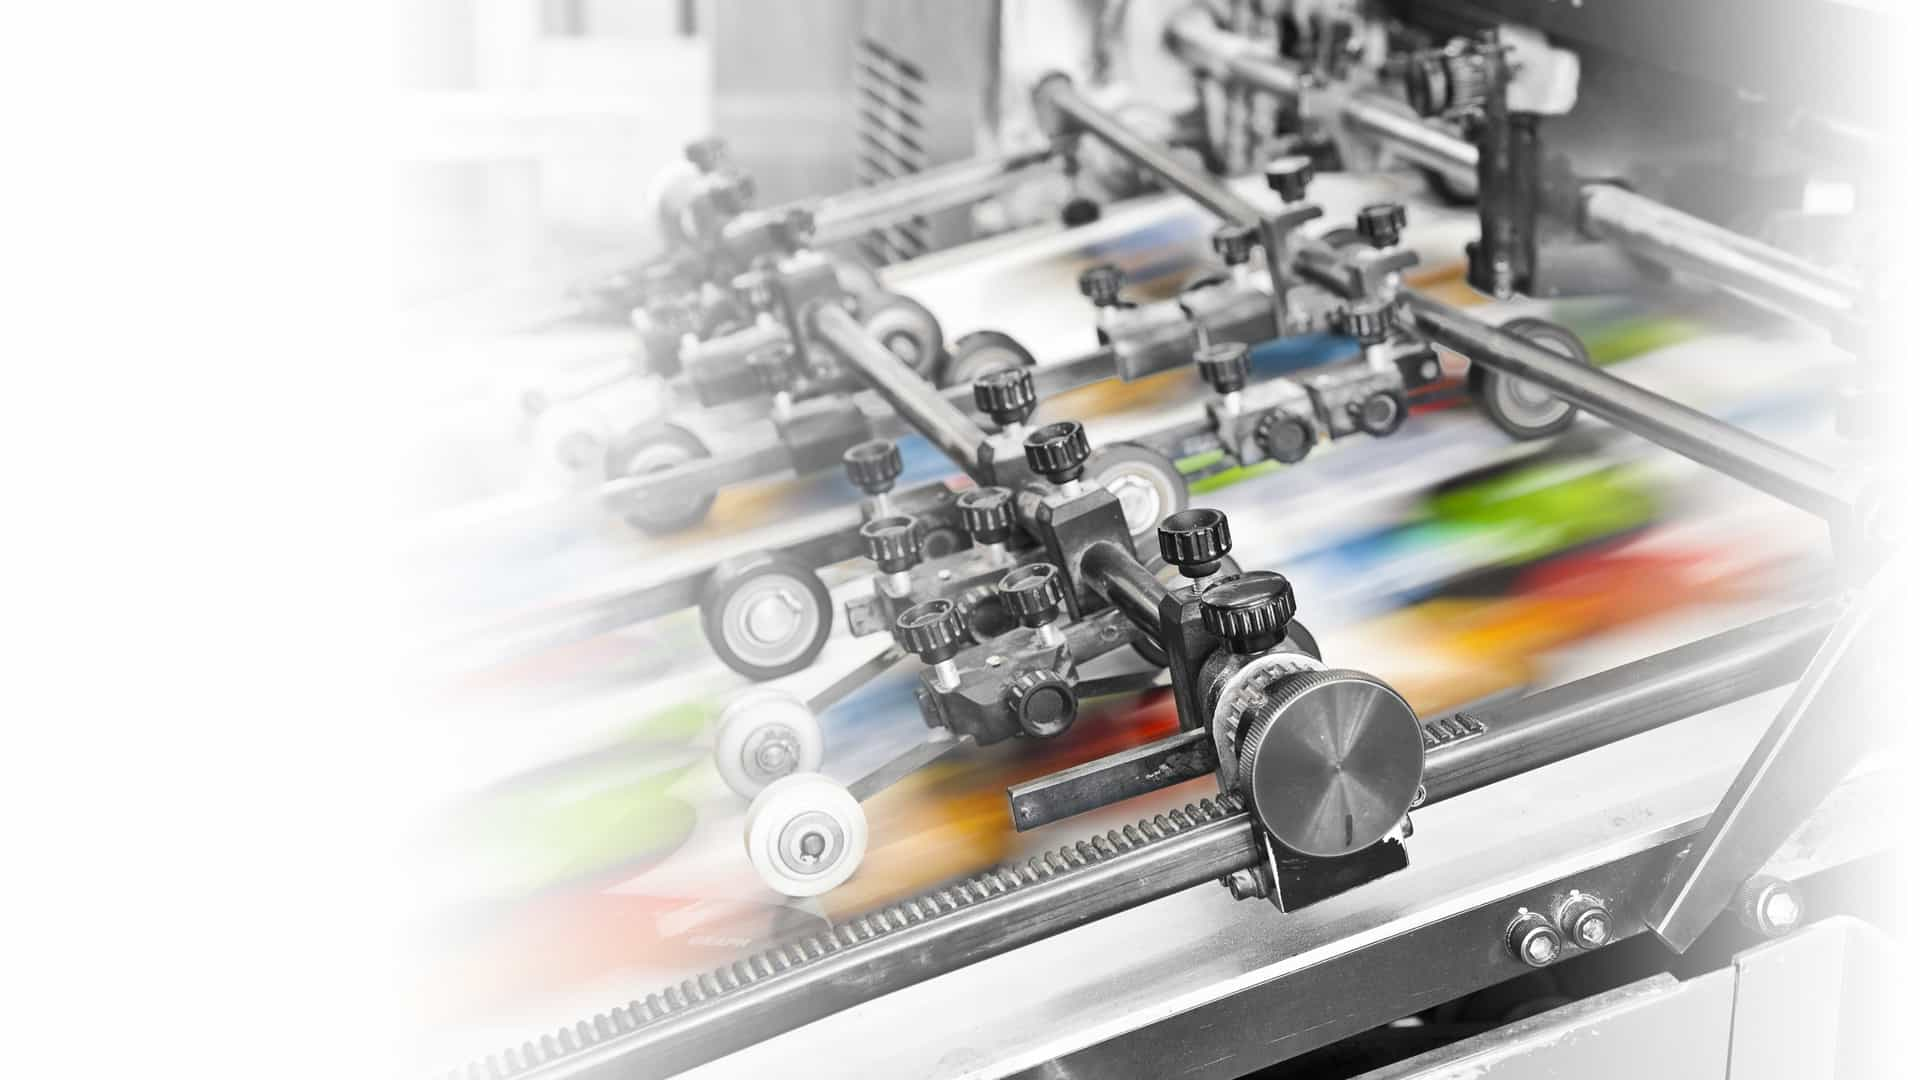 printers in yeovil, somerset - Polkadot Agency, Yeovil, Somerset, UK